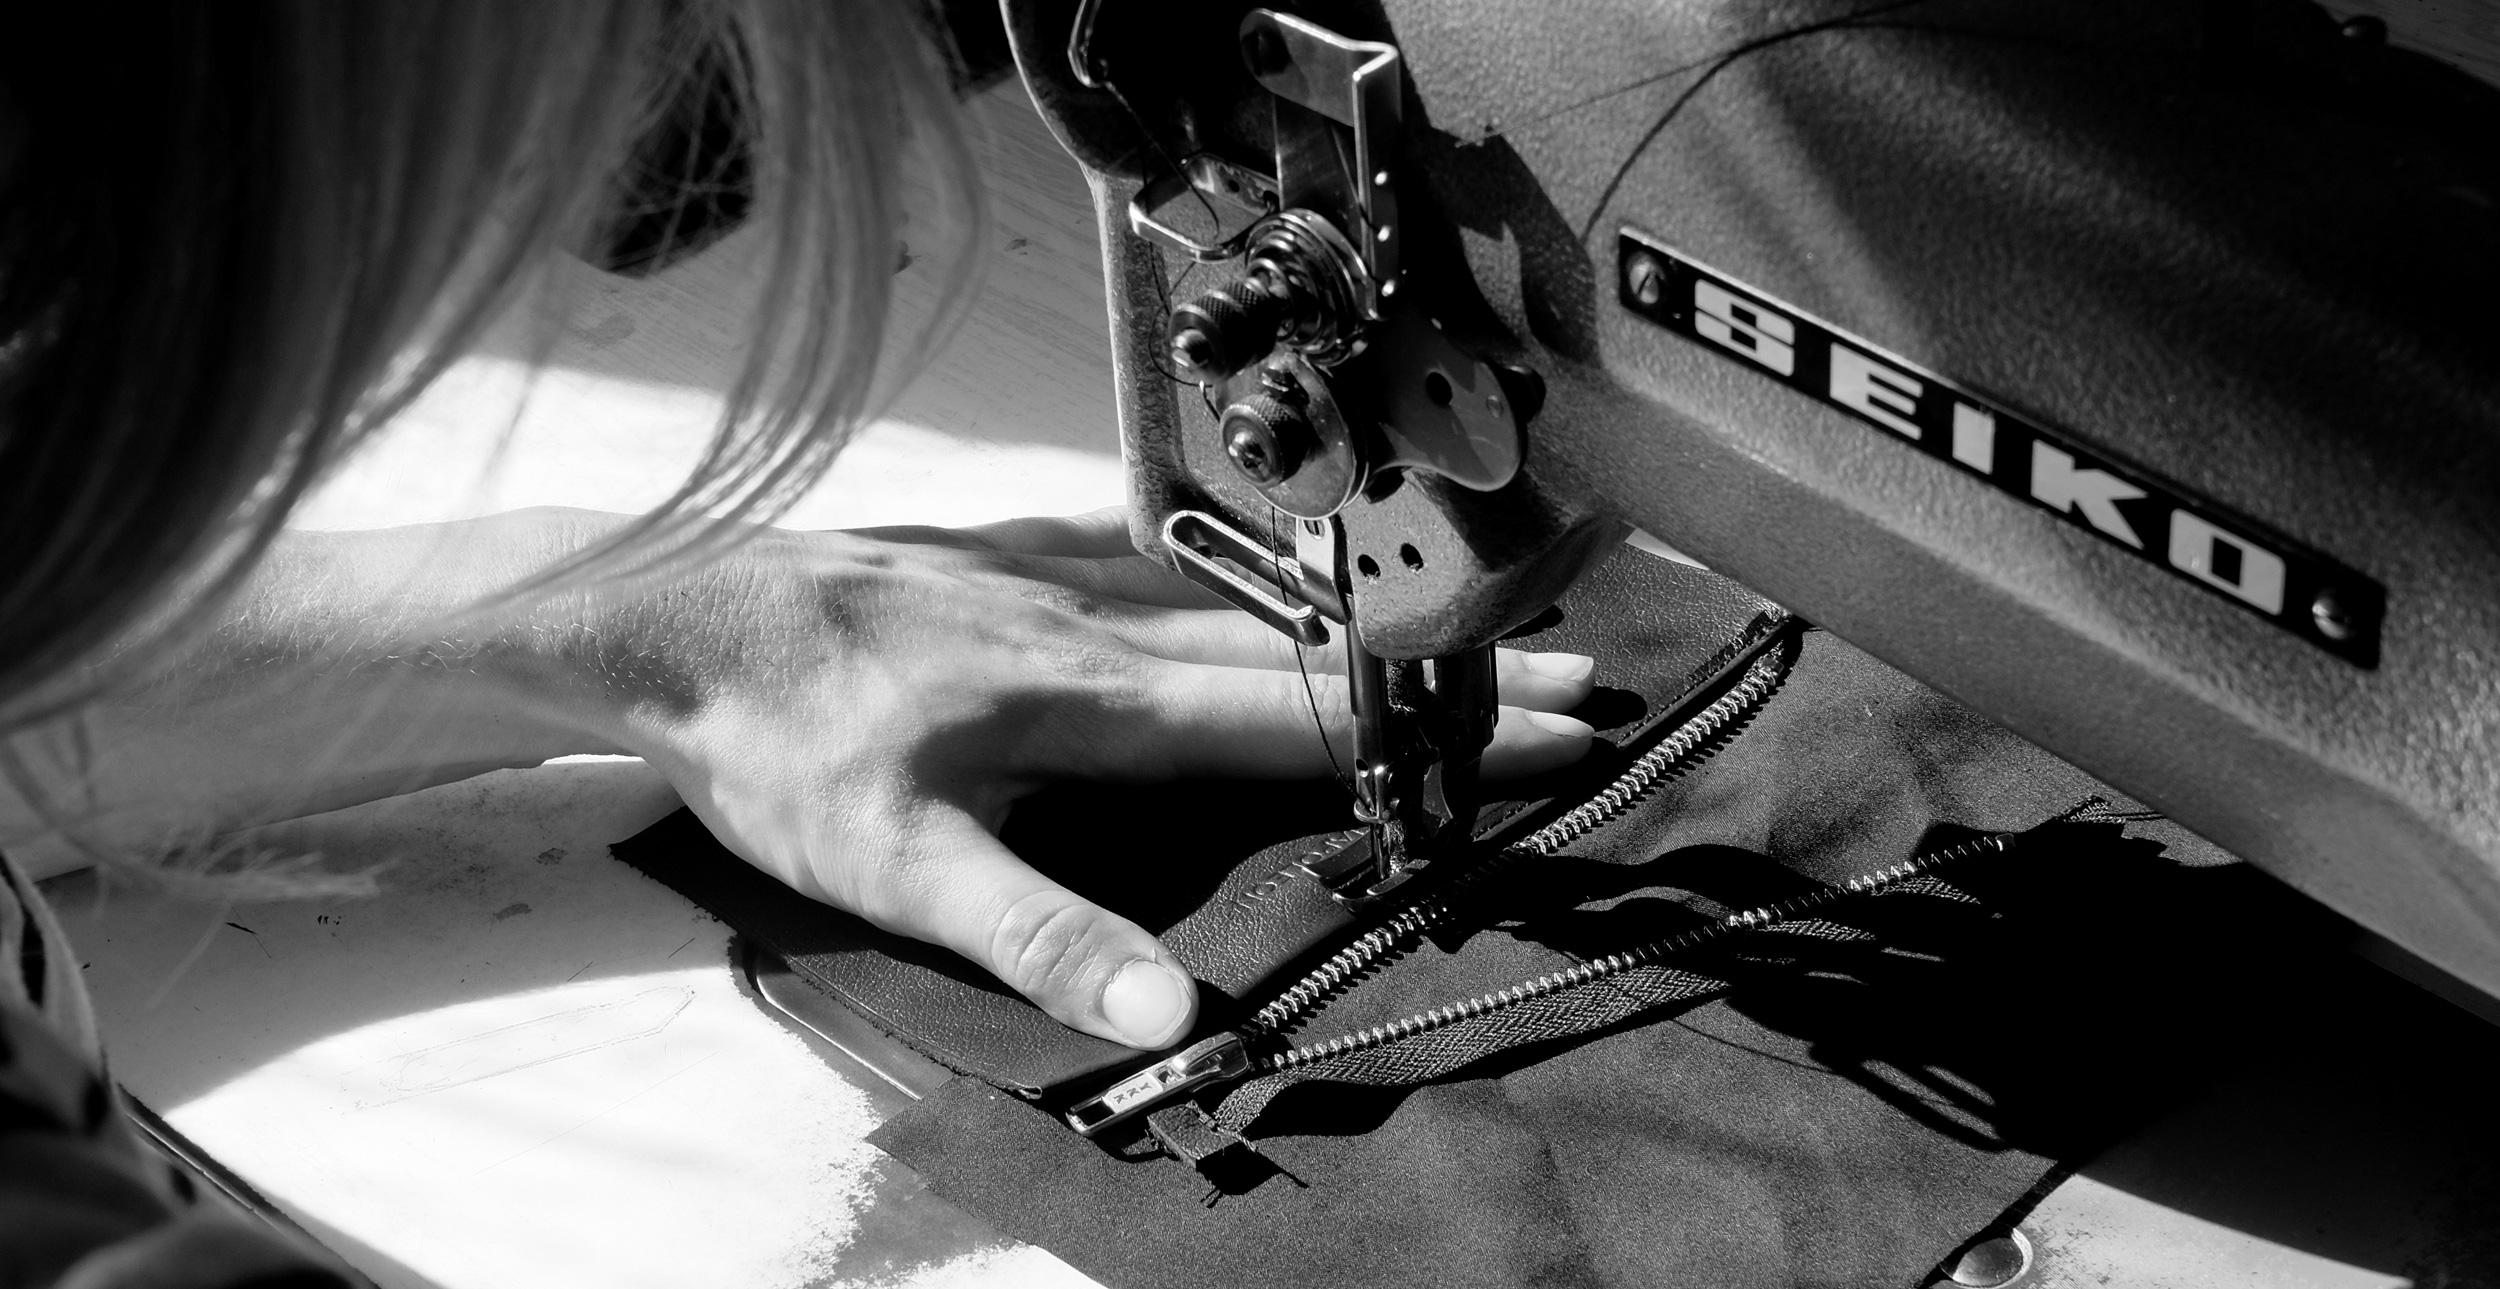 creative studio house of napoleon hand sewing leather